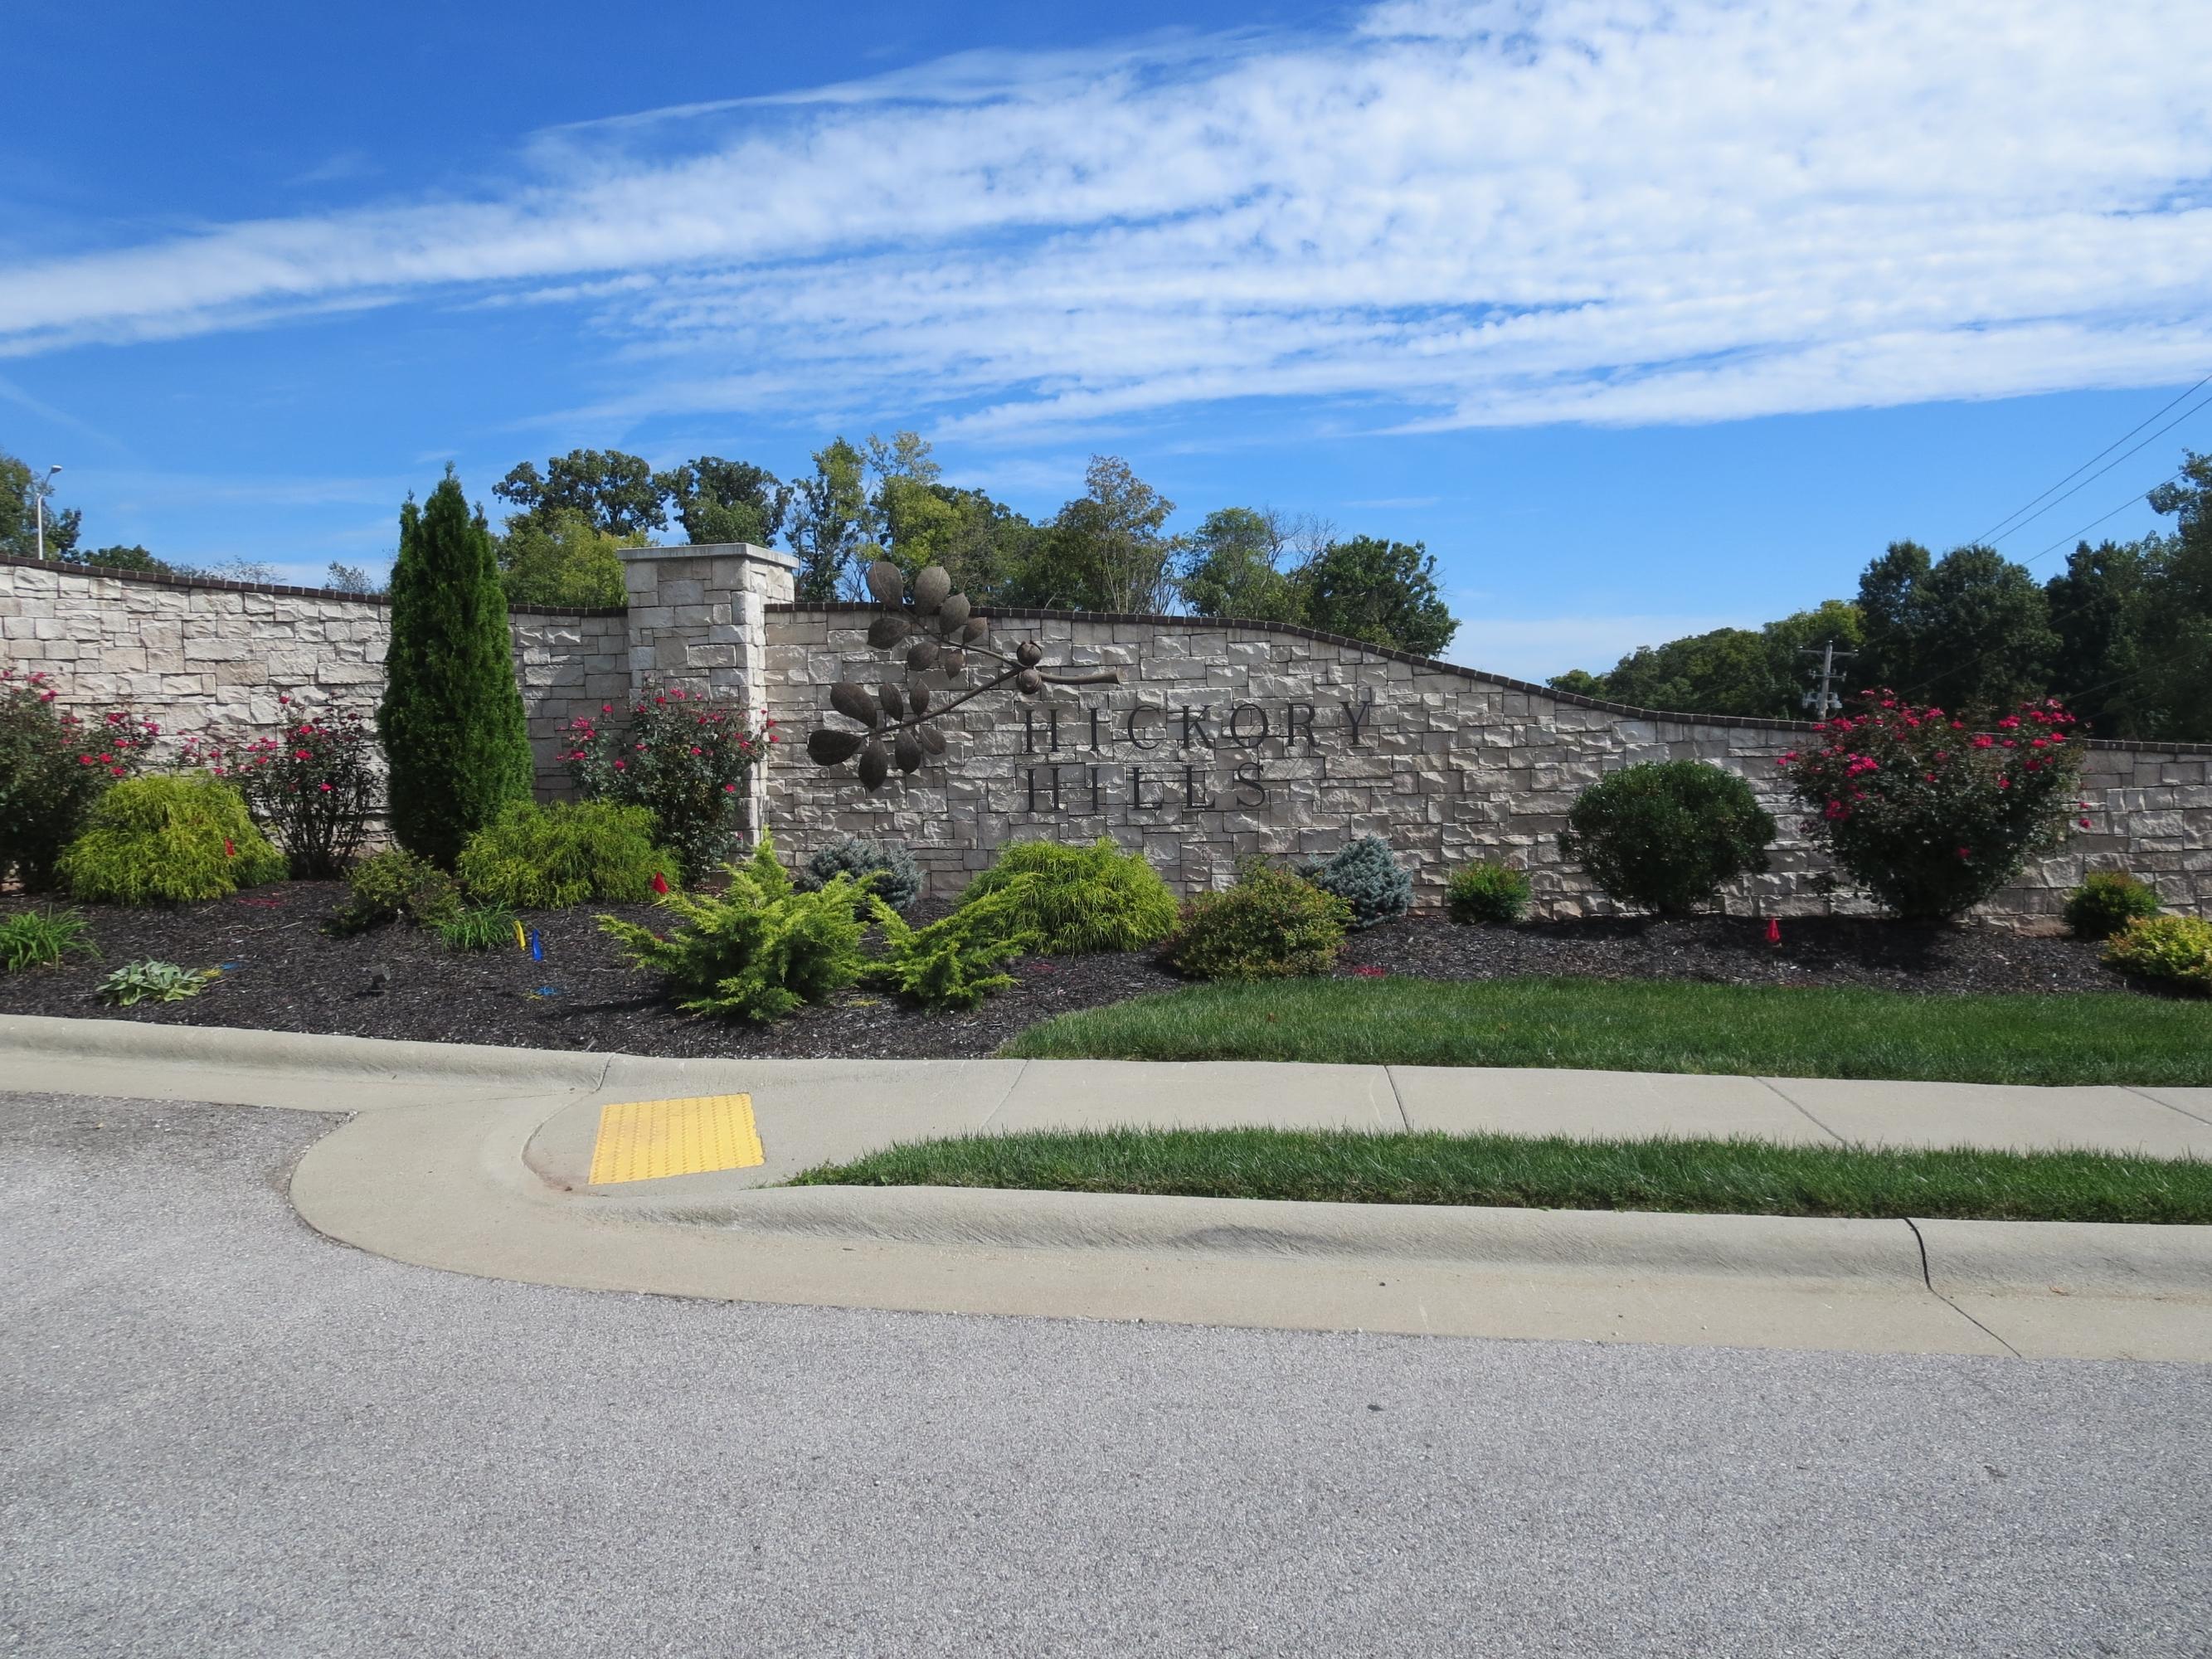 4012 East Burks Place, Springfield, Missouri 65809